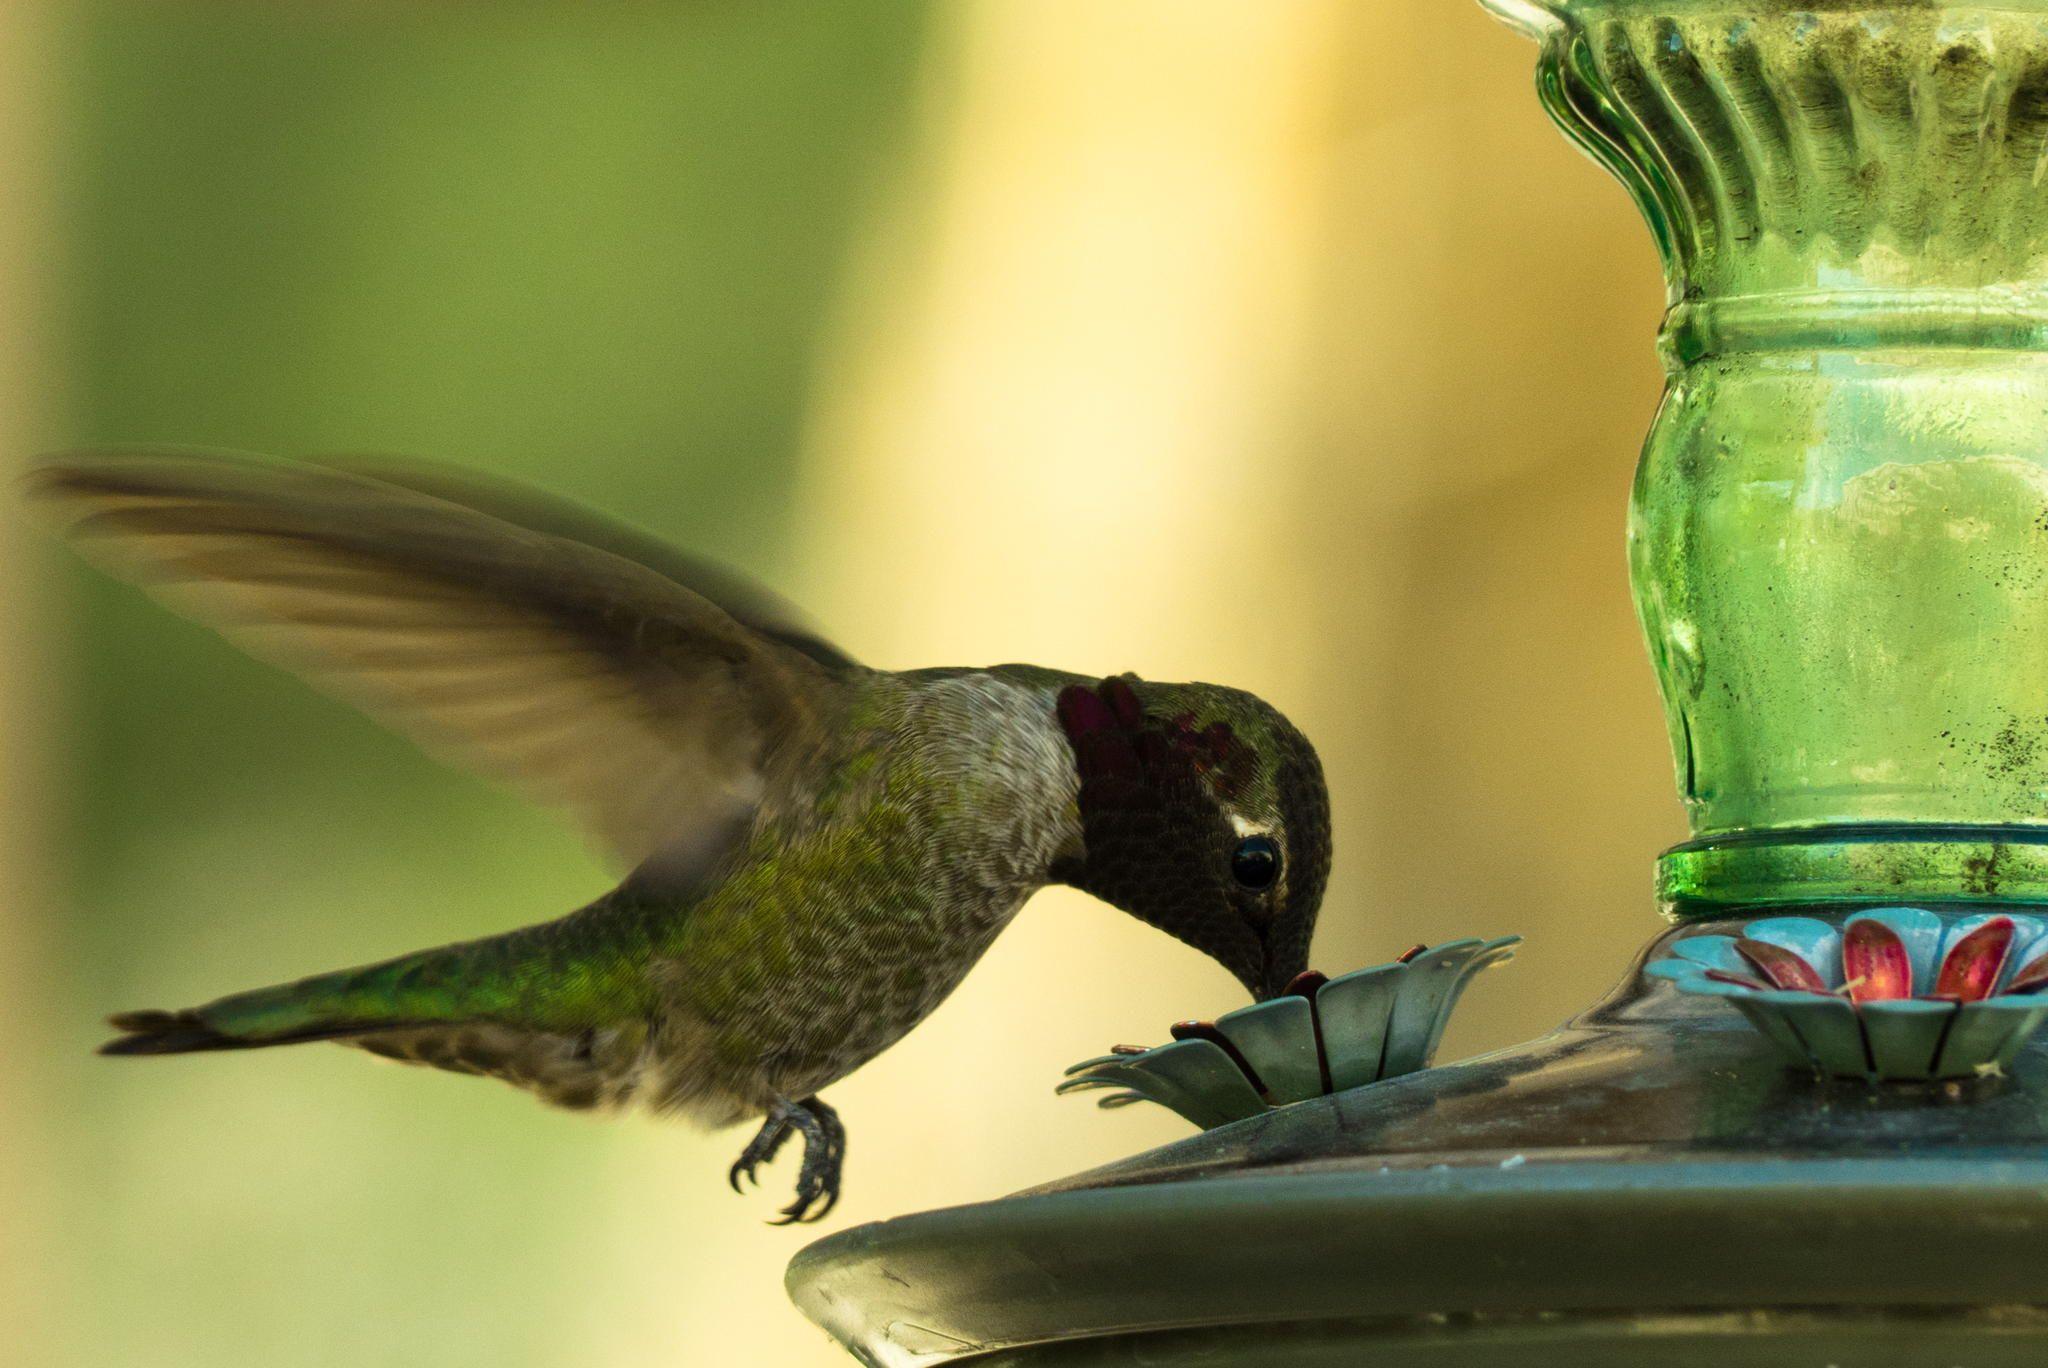 Green dreambird by Timm Hondr